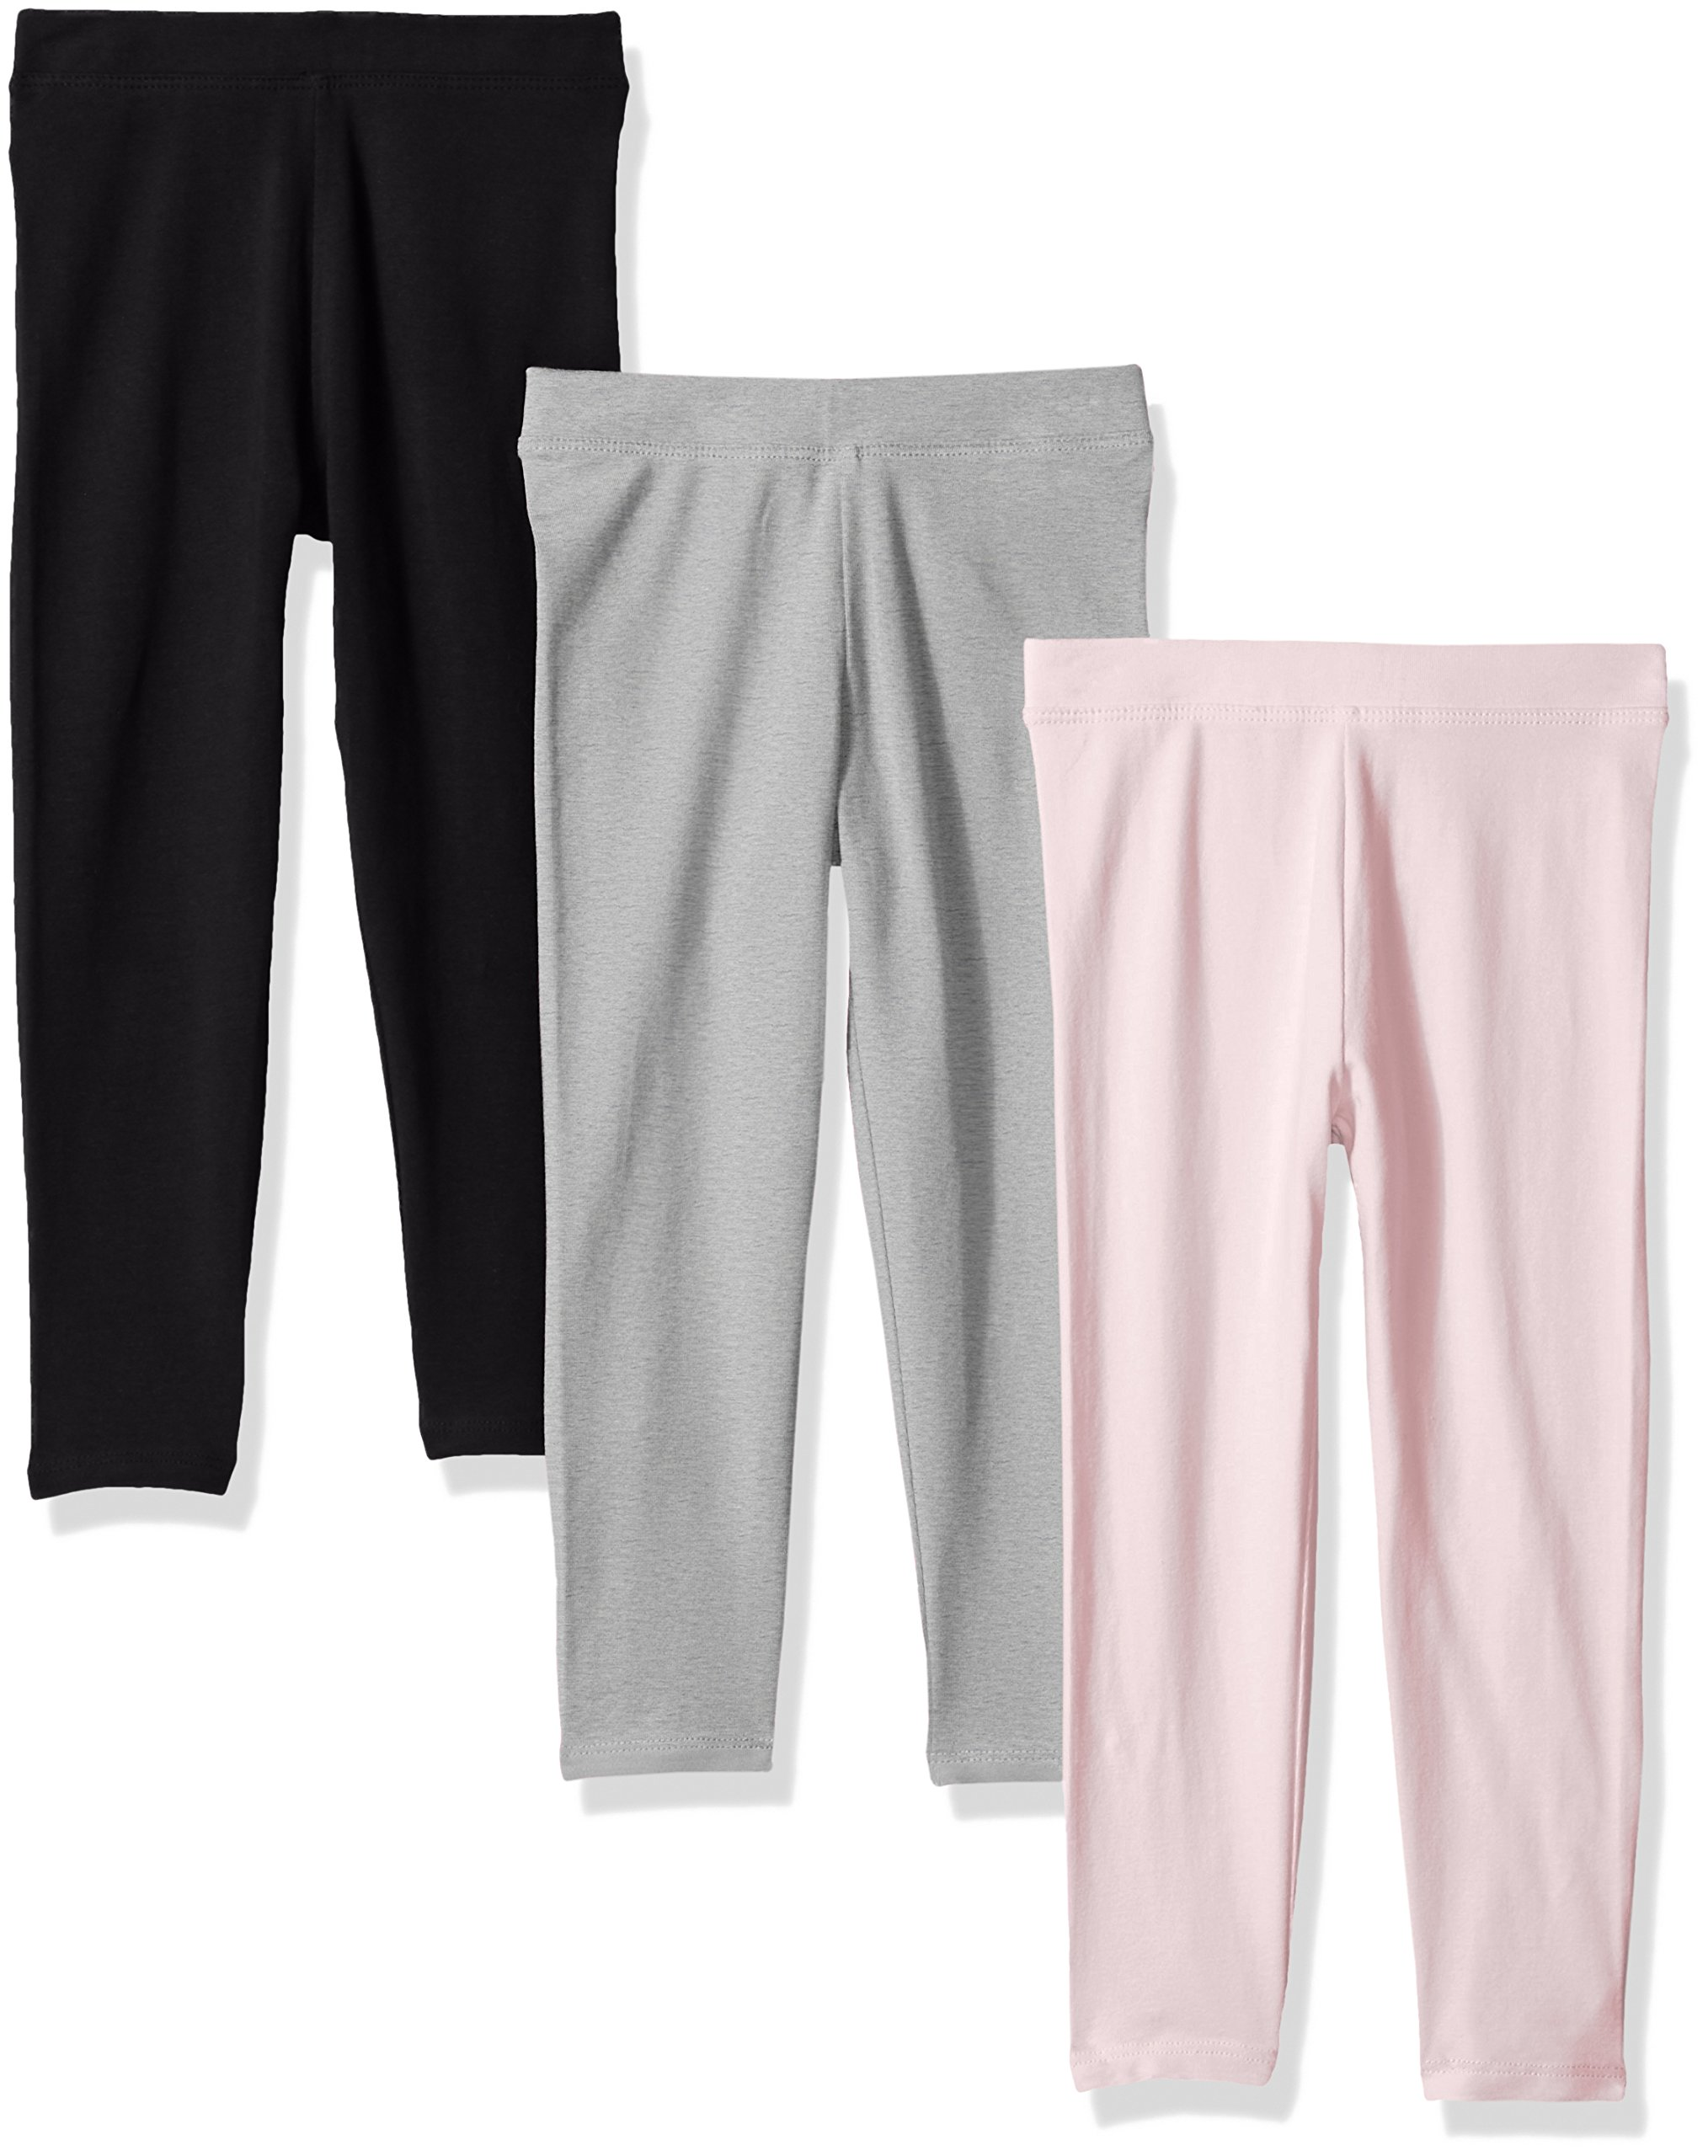 Amazon Essentials Girls' 3-Pack Leggings, Black/Heather Grey/Light Pink, 4T